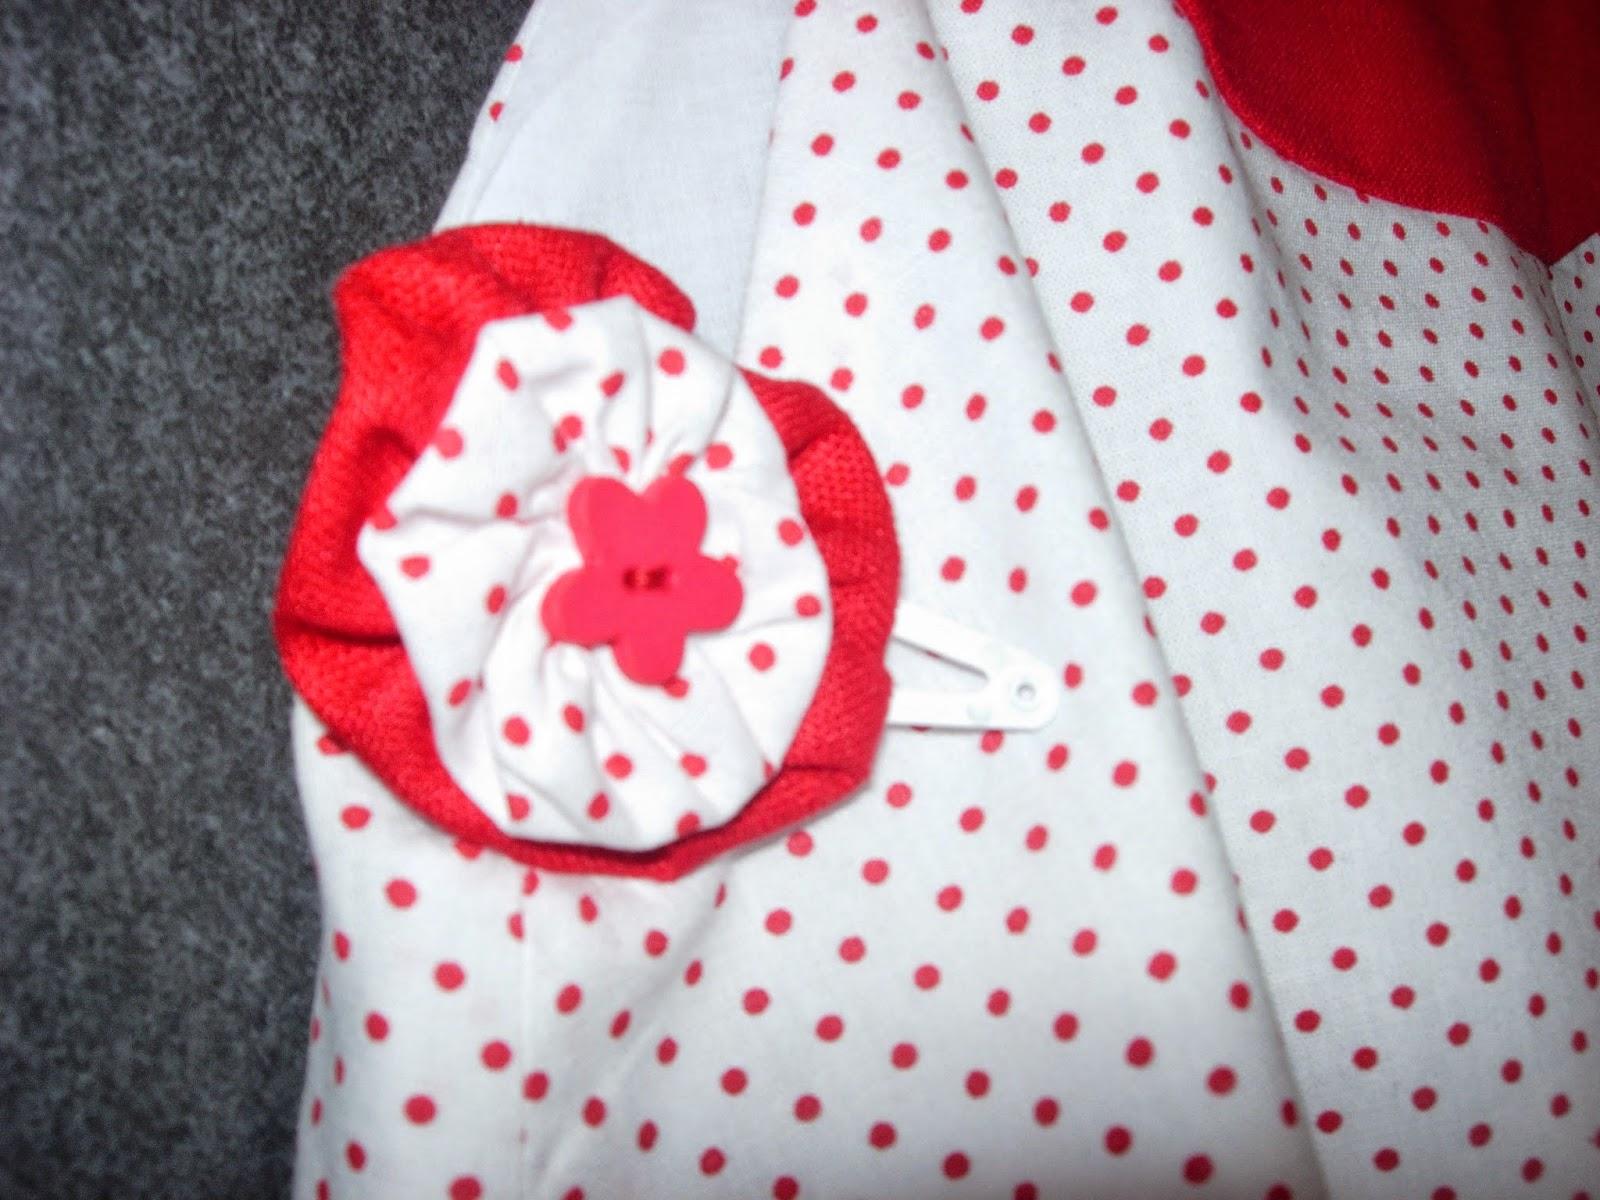 Couture origami de Céline Girardeau - barette